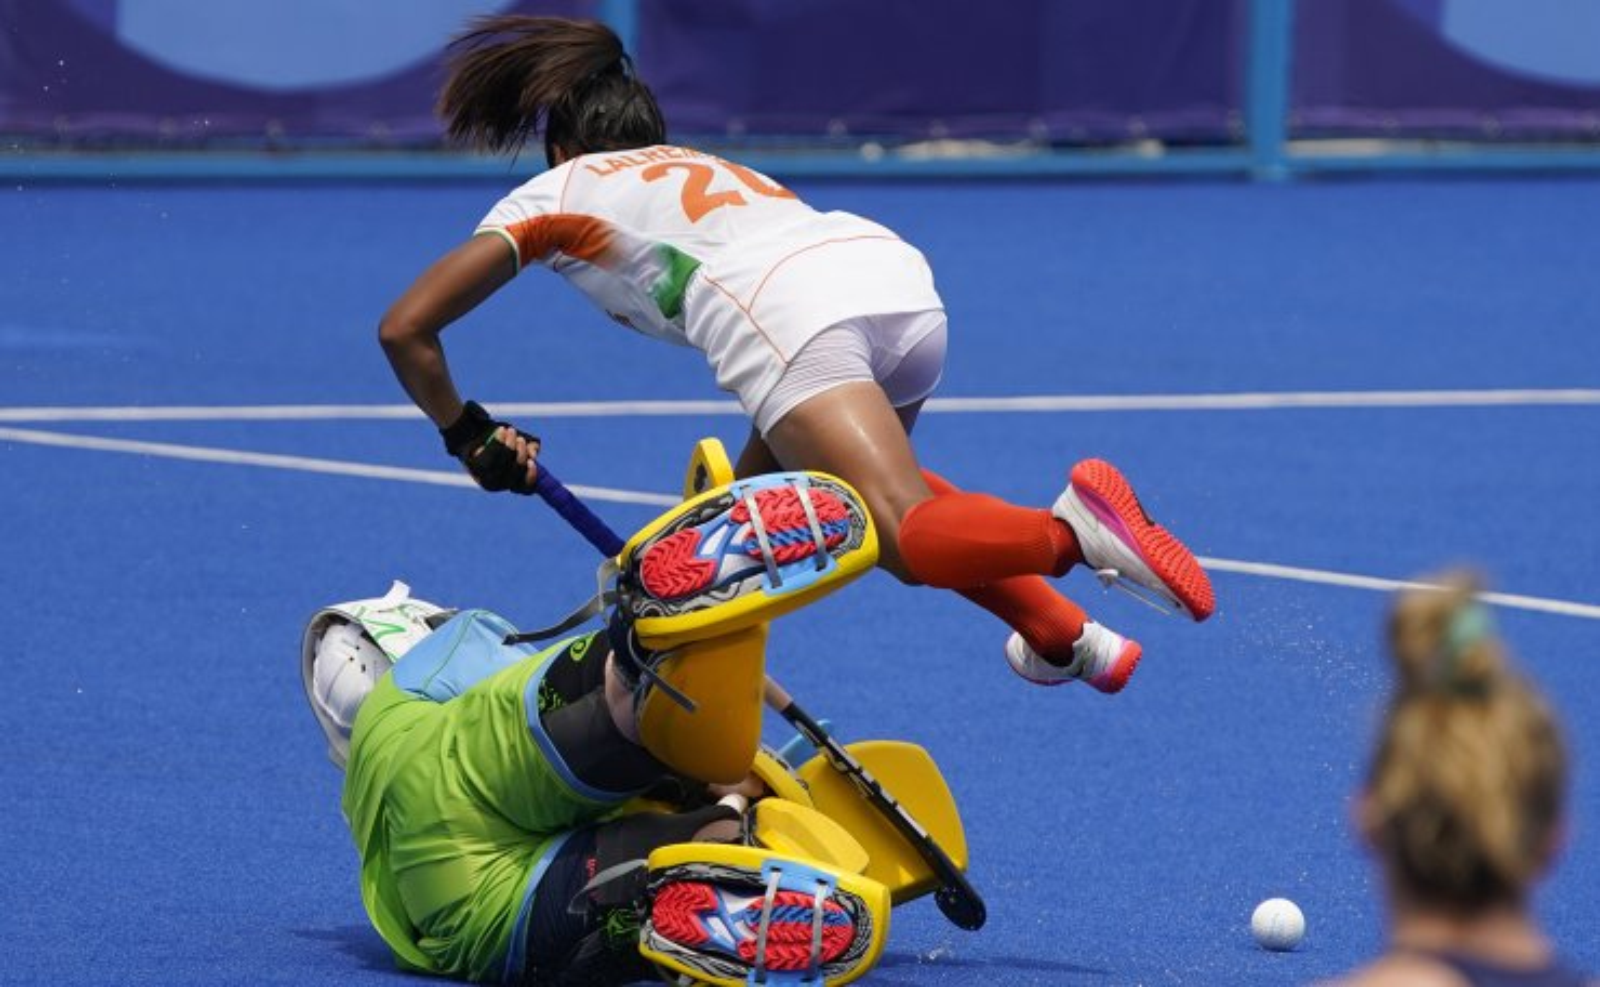 India forward Lalremsiami (20) falls over Ireland goalkeeper Ayeisha McFerran (1) during a women's field hockey match at the 2020 Summer Olympics, Friday, July 30, 2021, in Tokyo, Japan. AP